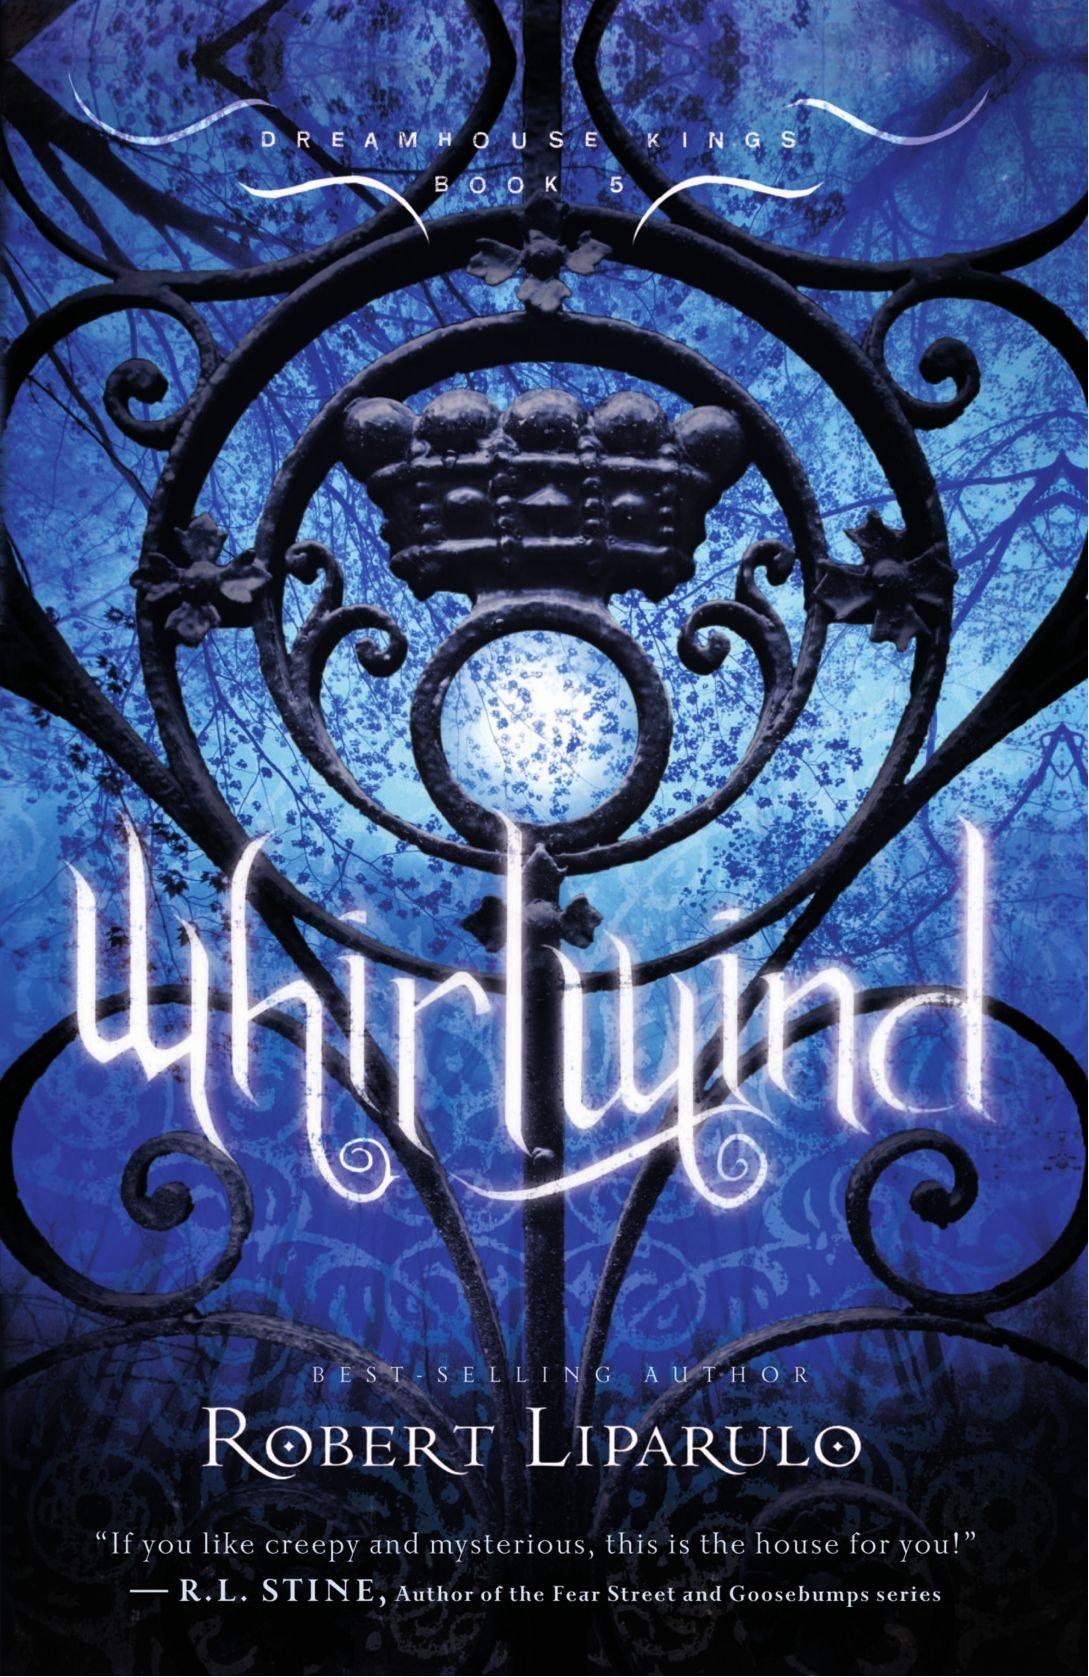 Download WHIRLWIND TPC (Dreamhouse Kings) PDF